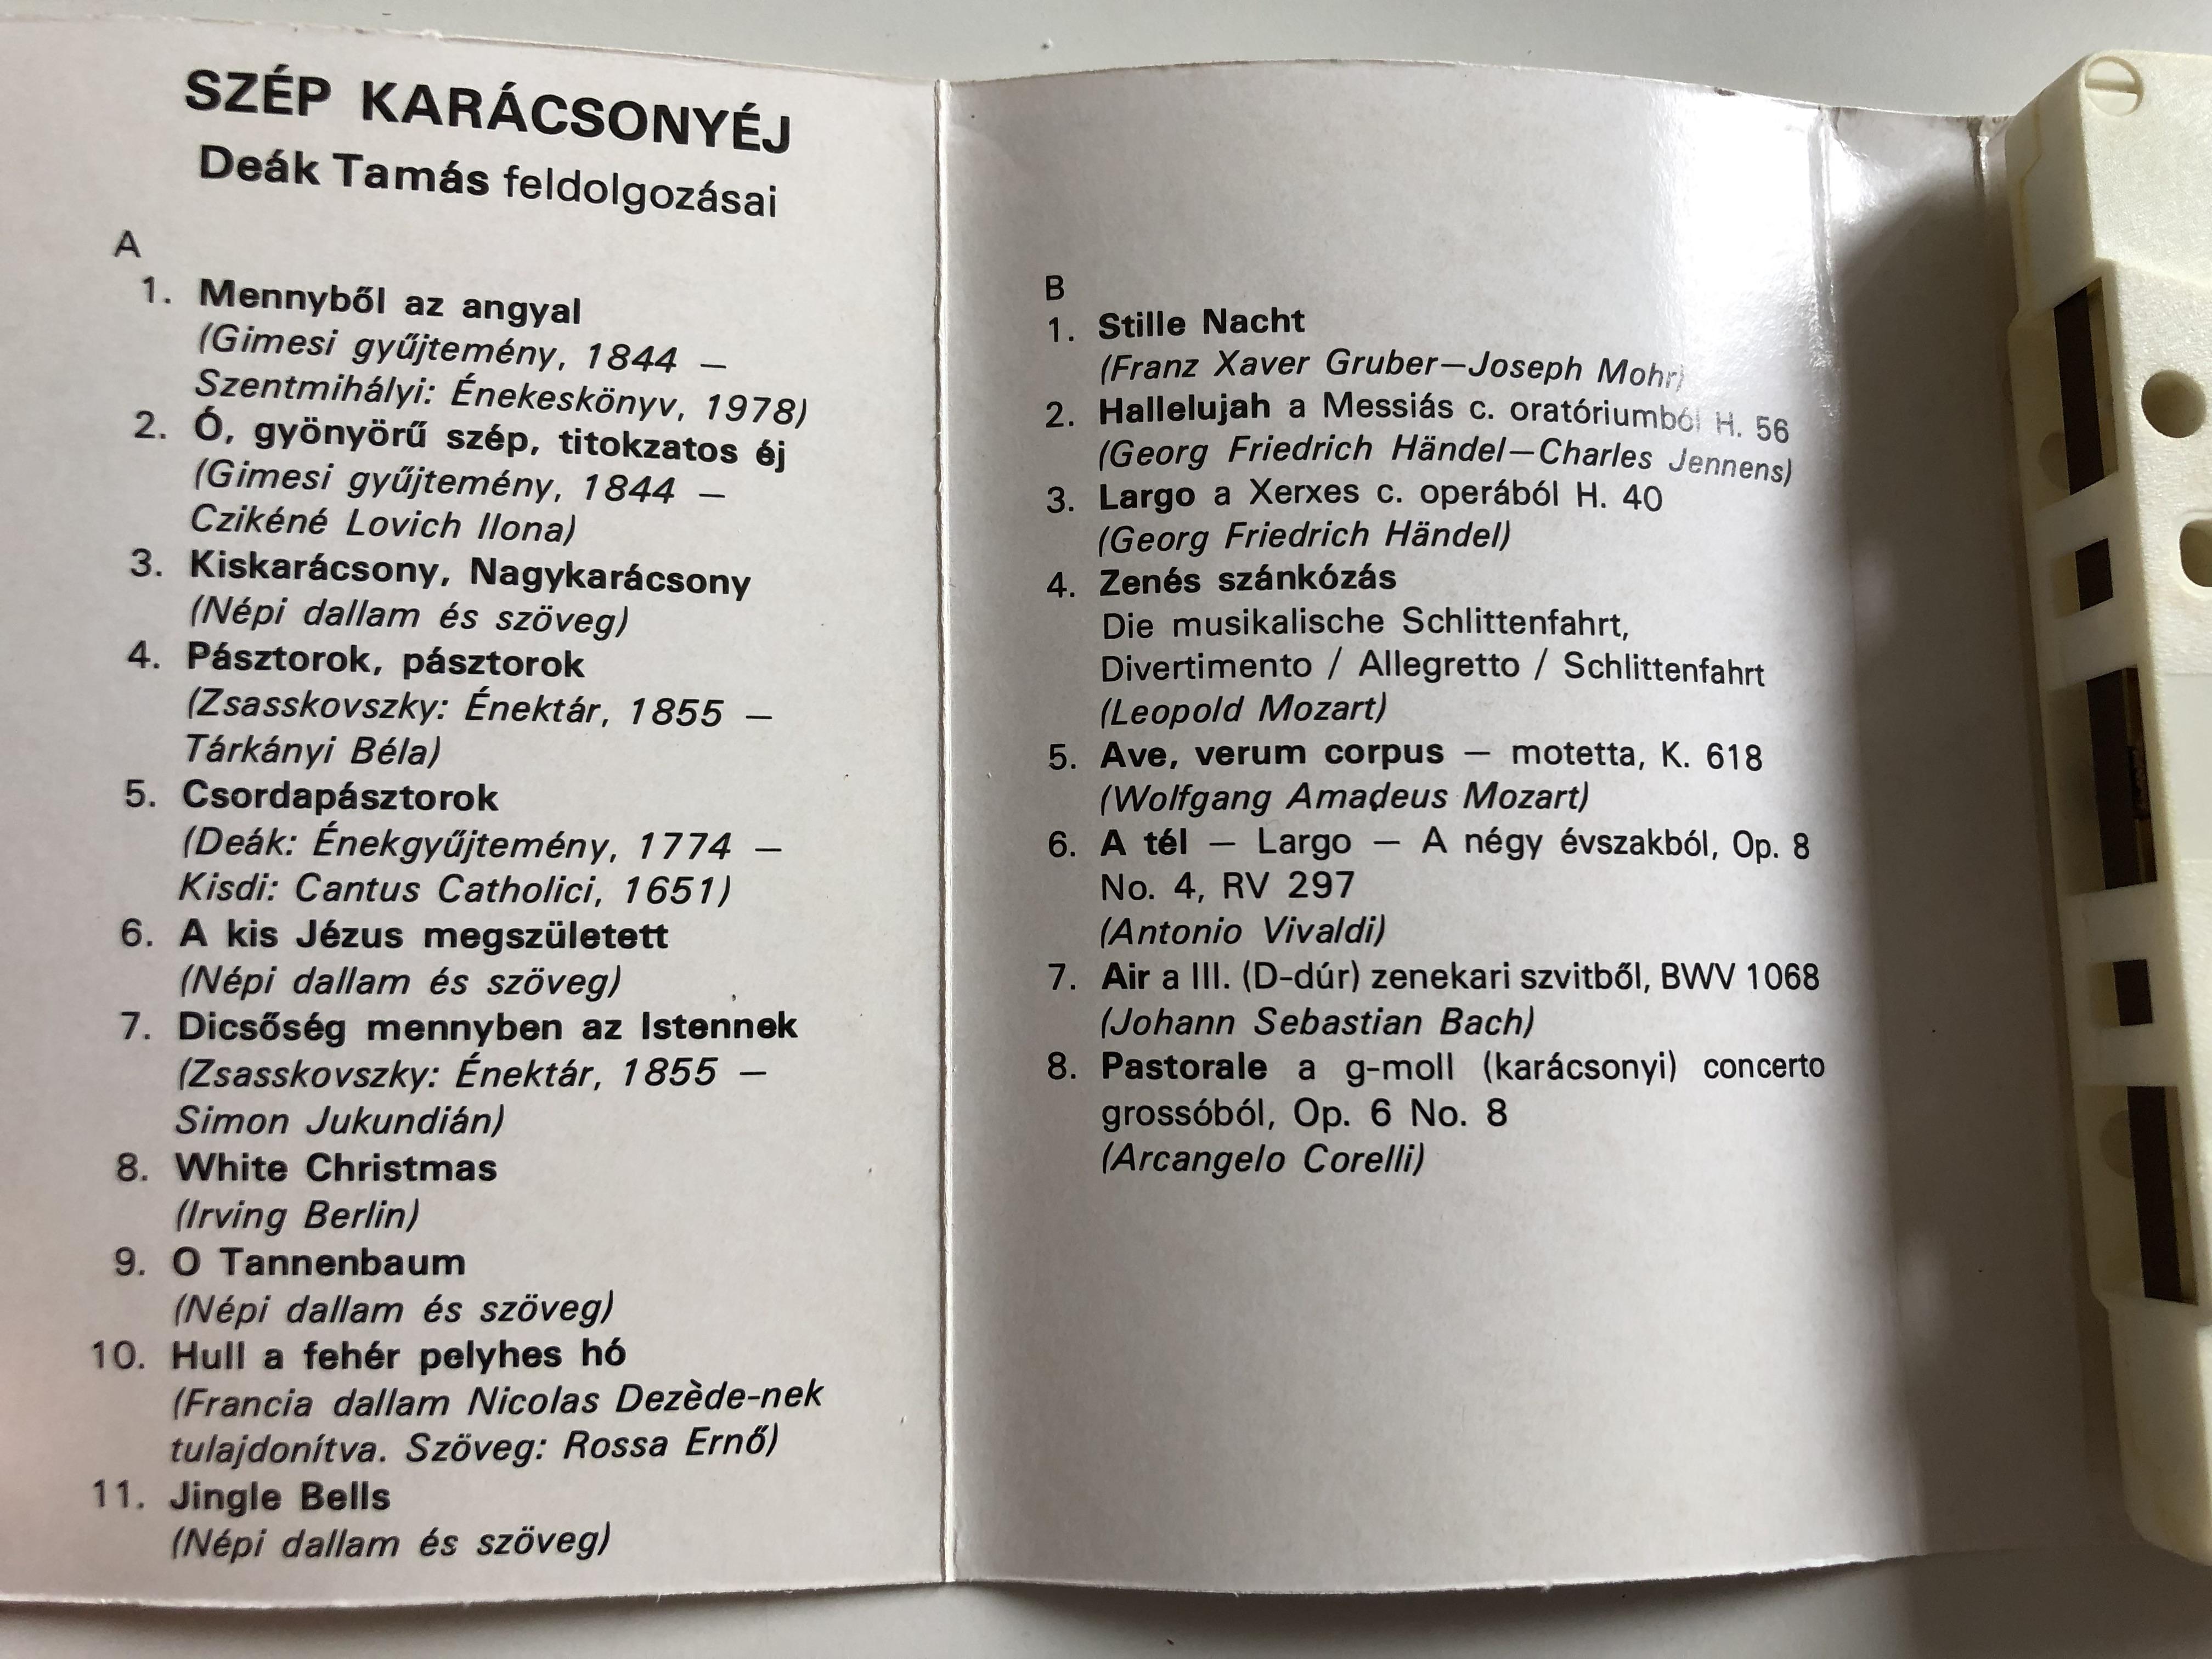 sz-p-kar-csony-j-nepszeru-karacsonyi-dallamok-de-k-tam-s-feldolgozasaban-qualiton-cassette-stereo-mk-16694-3-.jpg